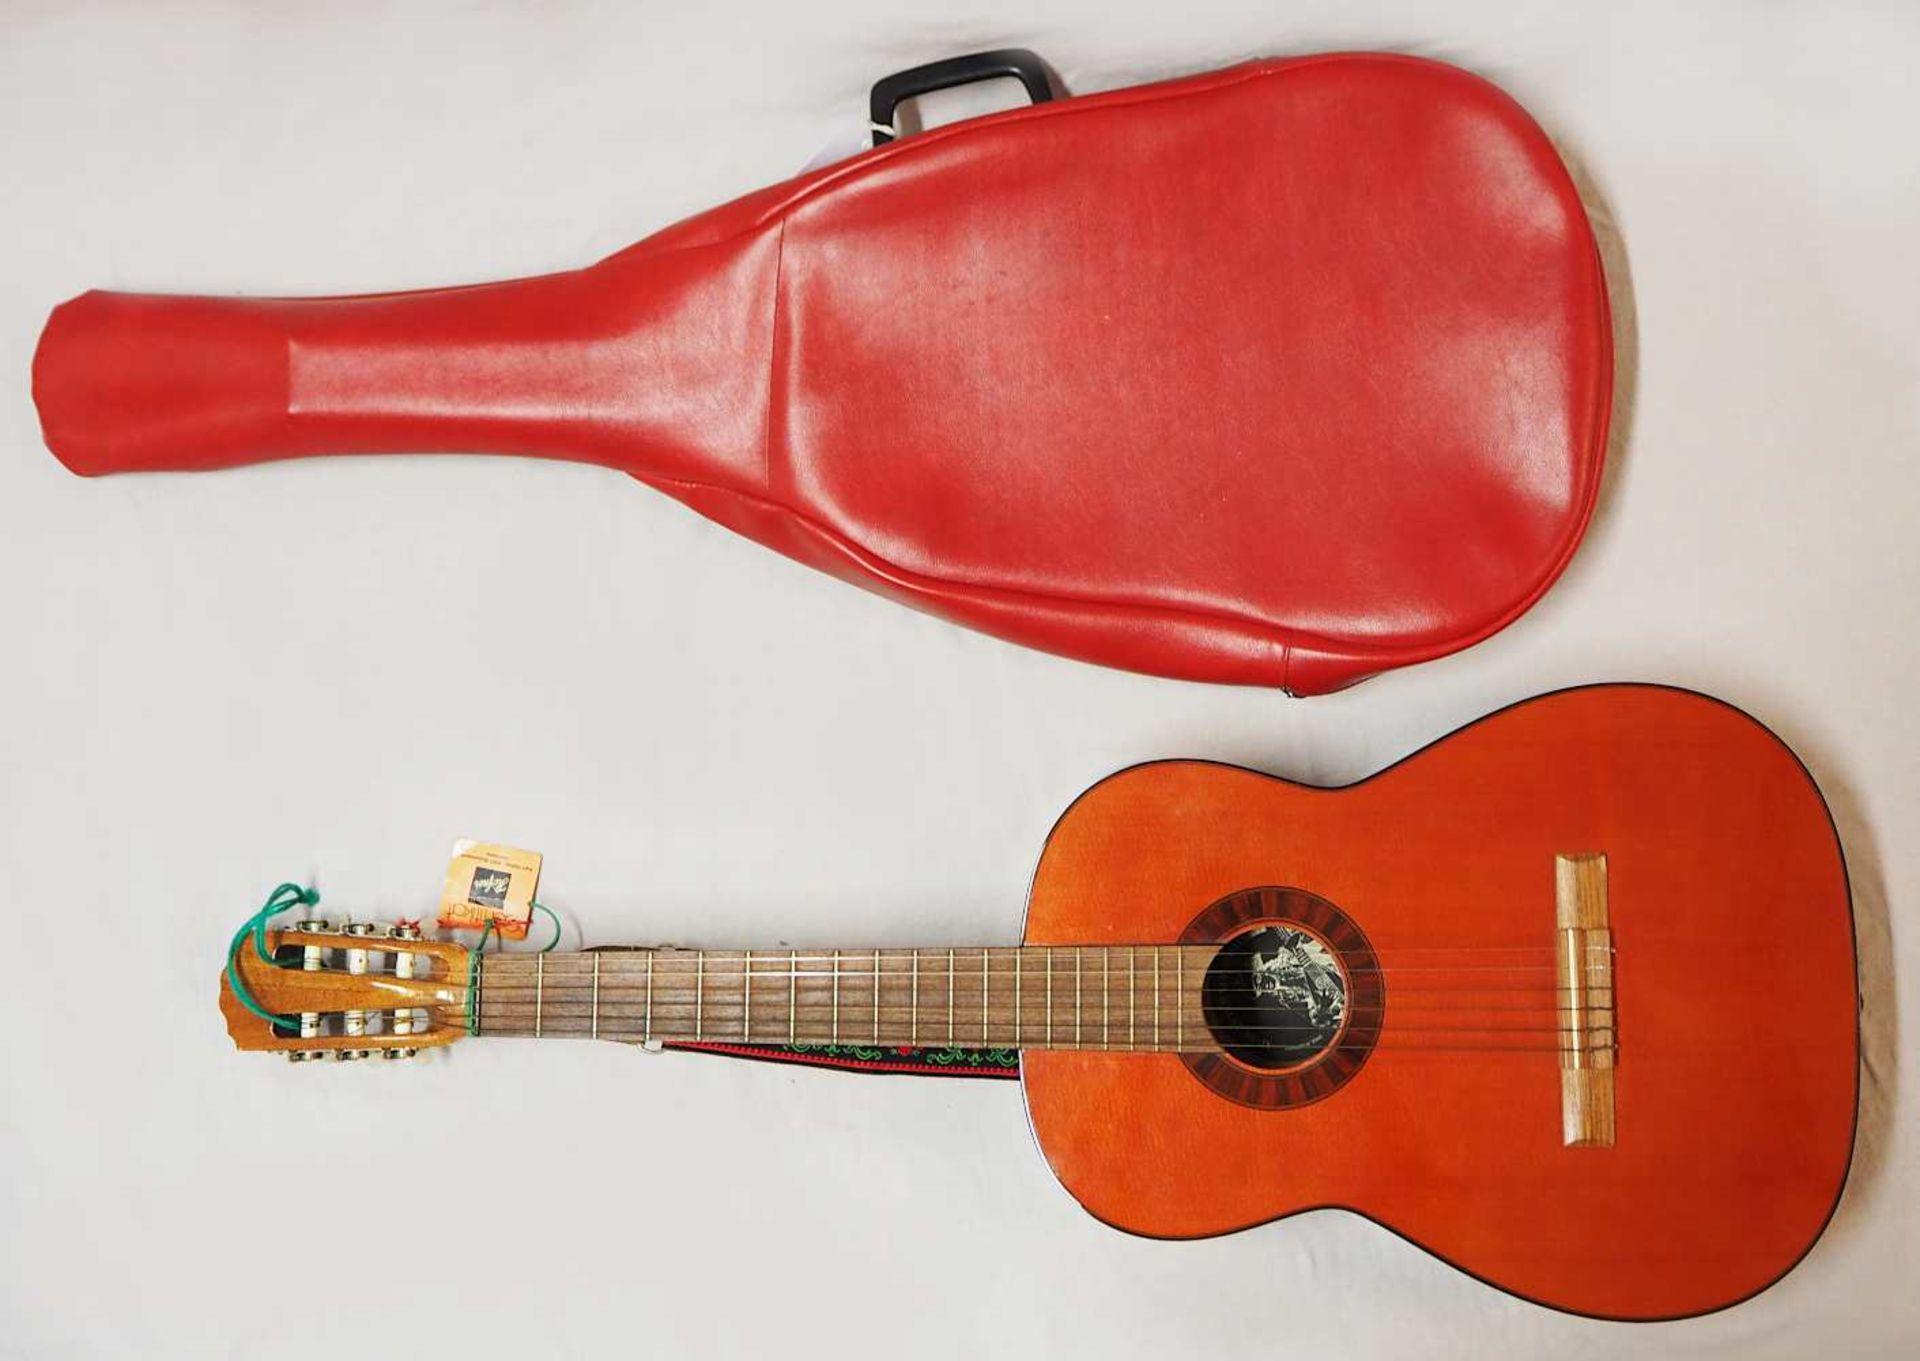 1 Konzert-Gitarre HÖFNER Modellnummer: 4840, wohl z.T. Rosenholz min. intarsiert auf - Bild 3 aus 8